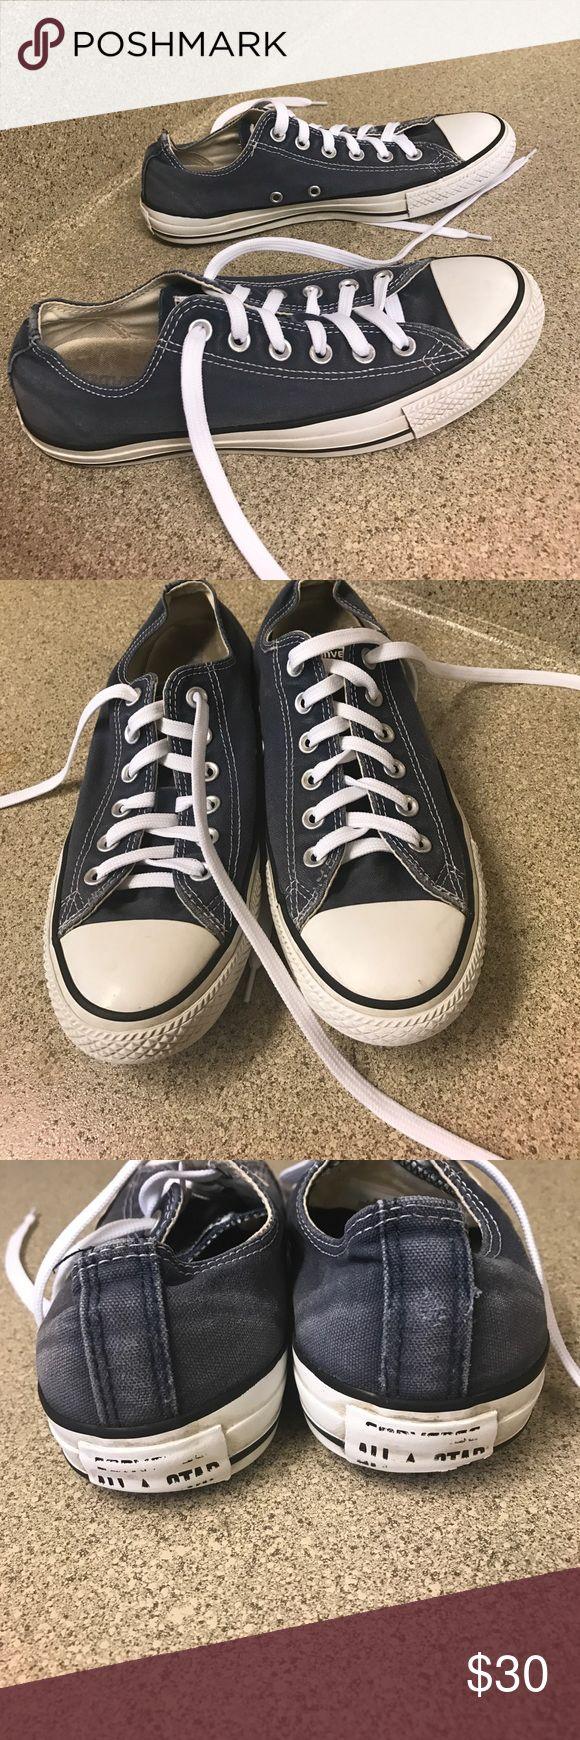 can you wash converse in the washing machine